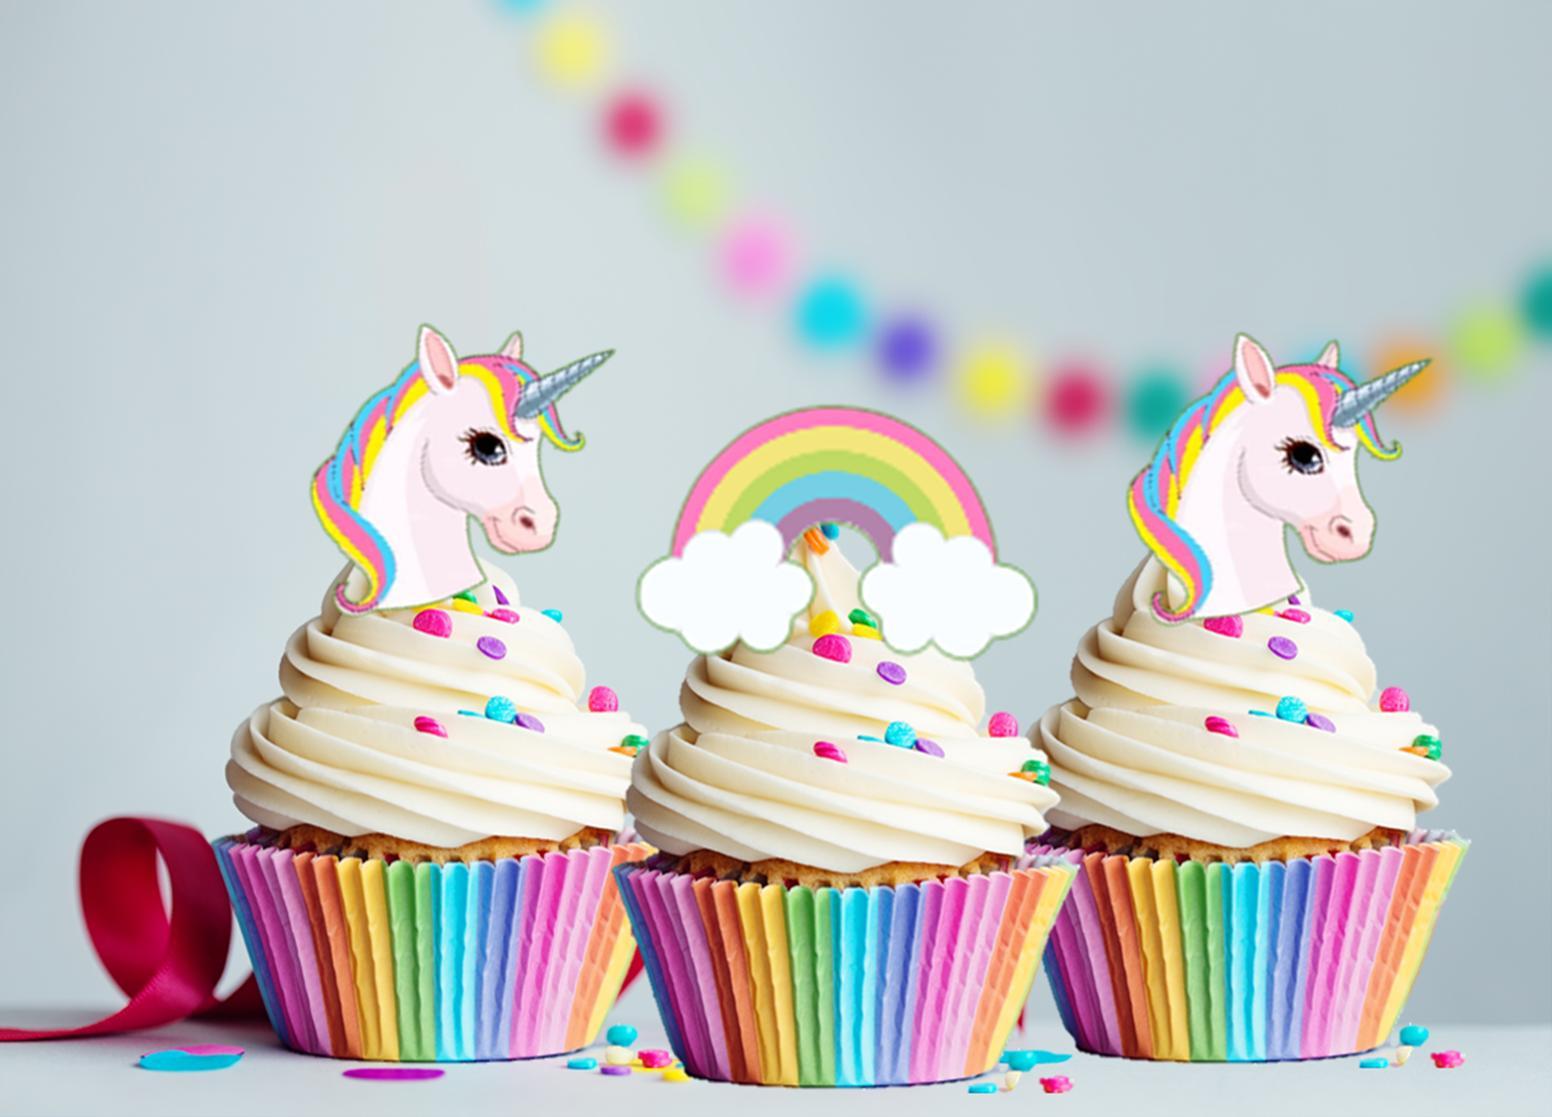 30 x mini unicorn and rainbows edible